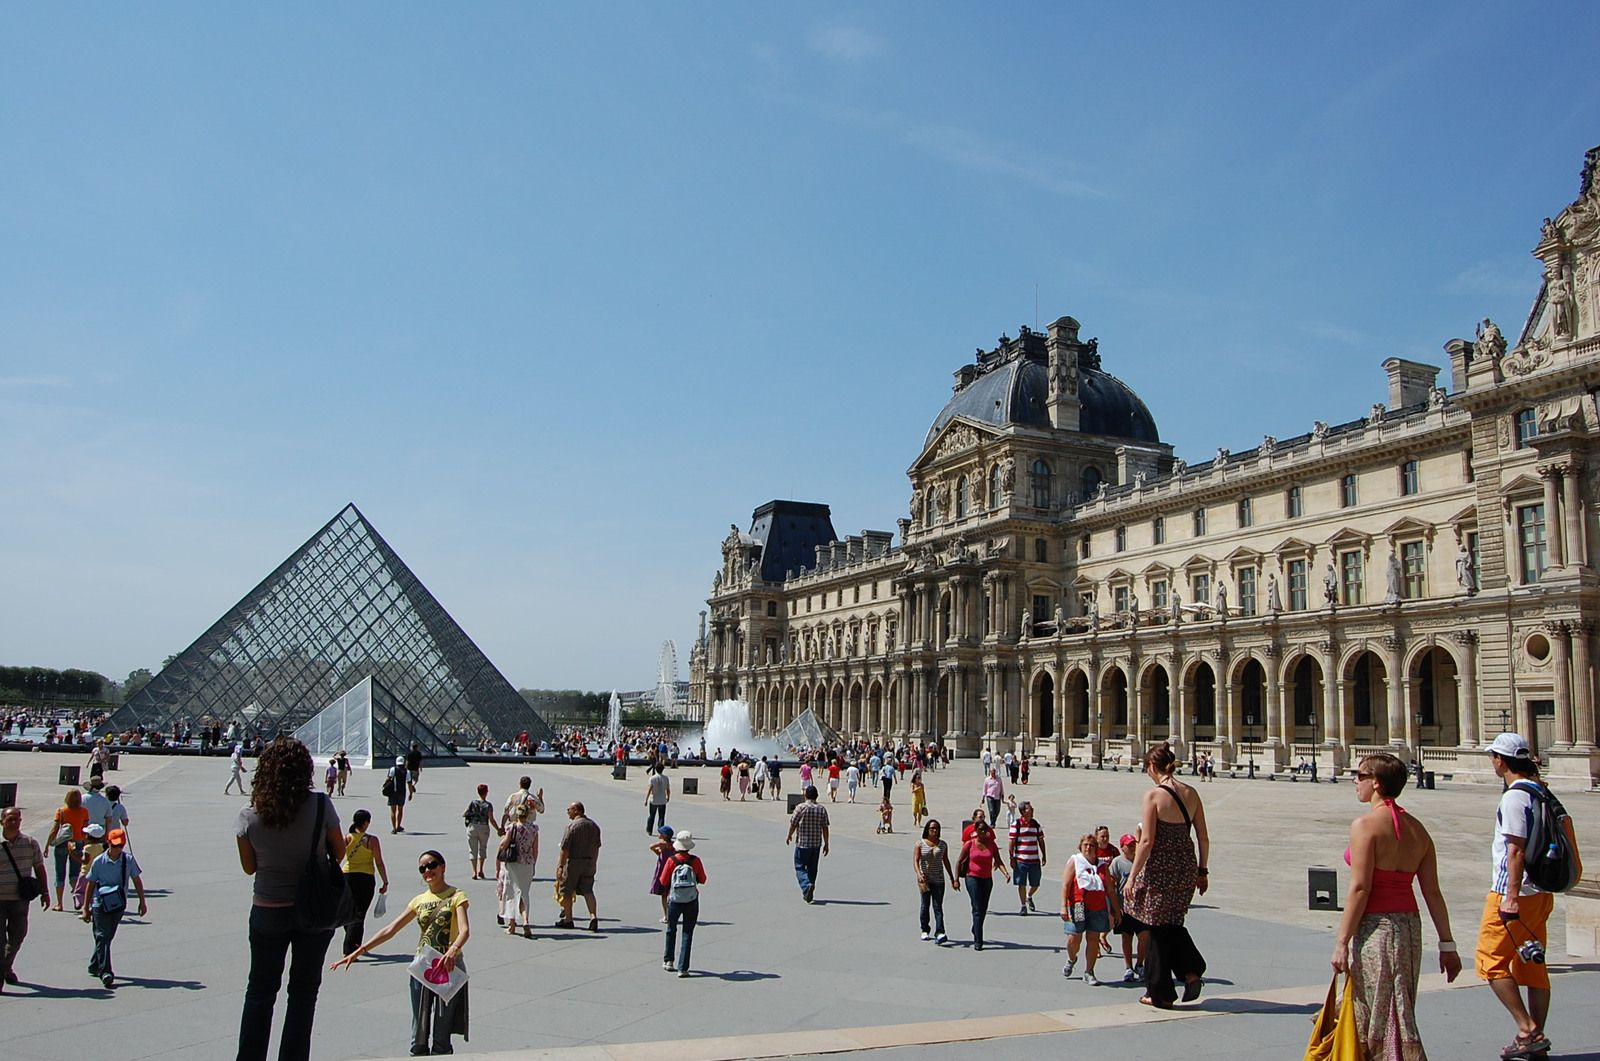 Pei - Pyramide du Louvre - paris - Photos: Lankaart (c)